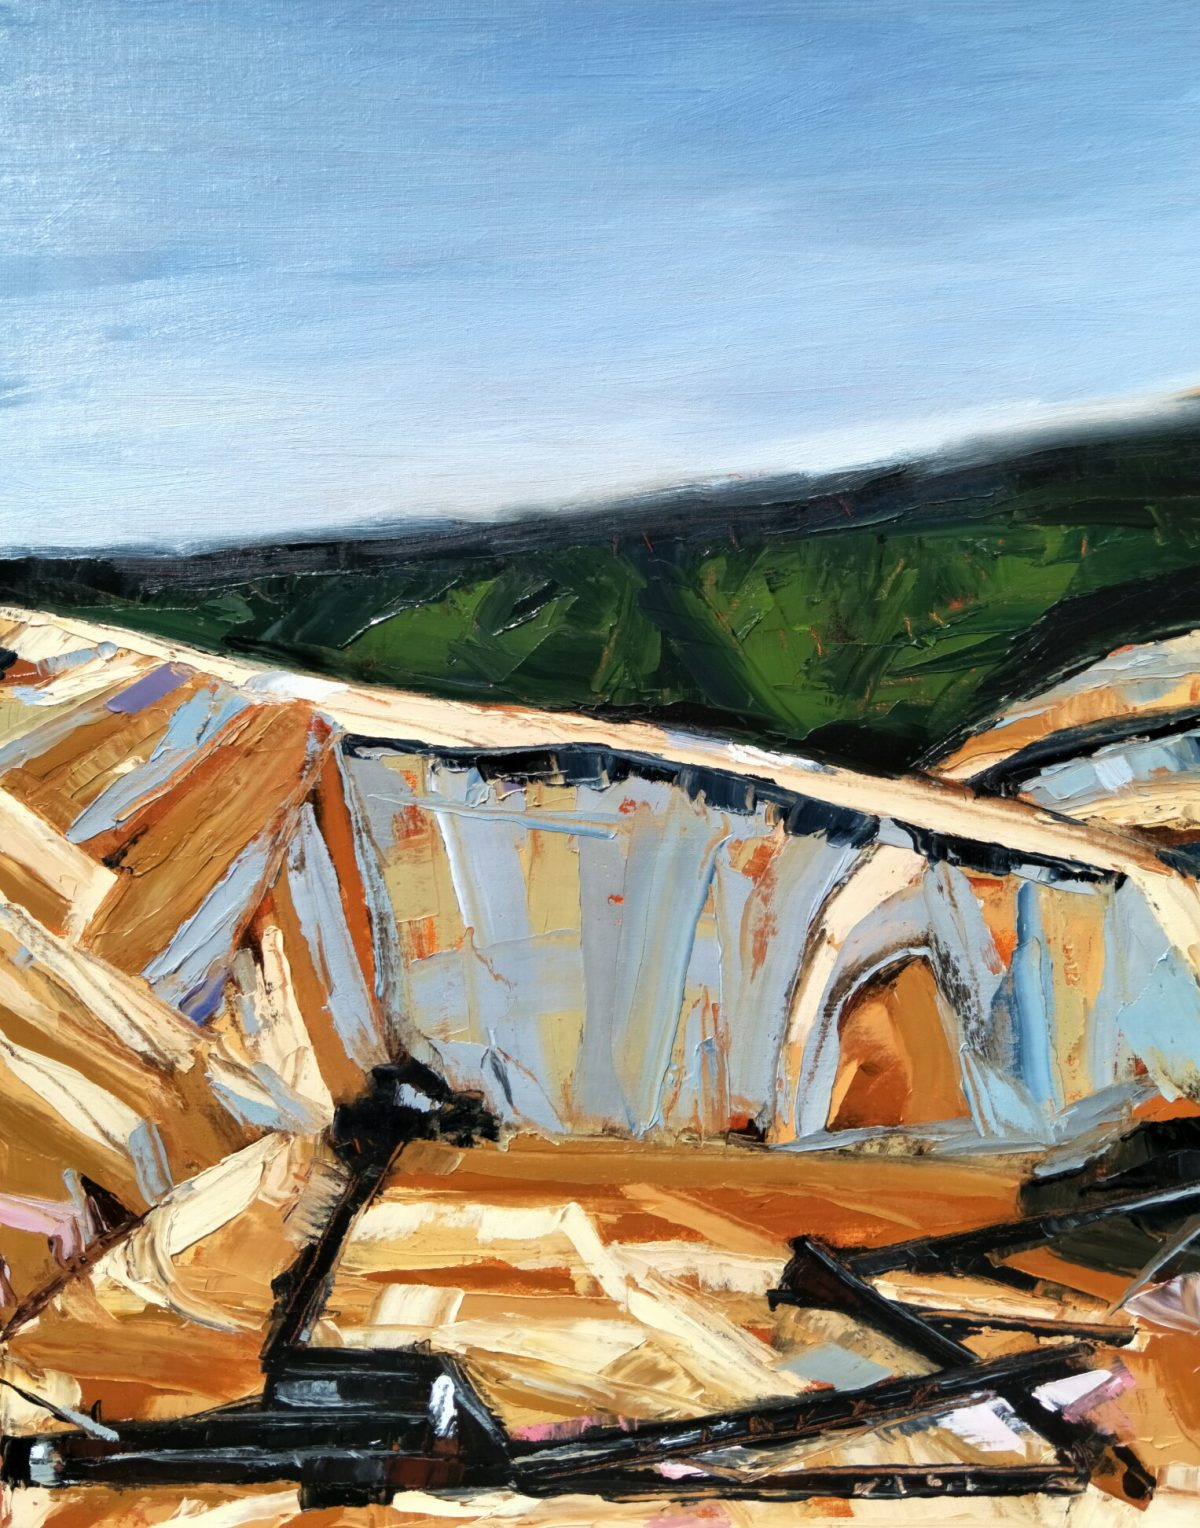 Art Atrium Nick Ferguson TMWM no.1, 2018, oil on Belgian linen, 76x61cm, $2500